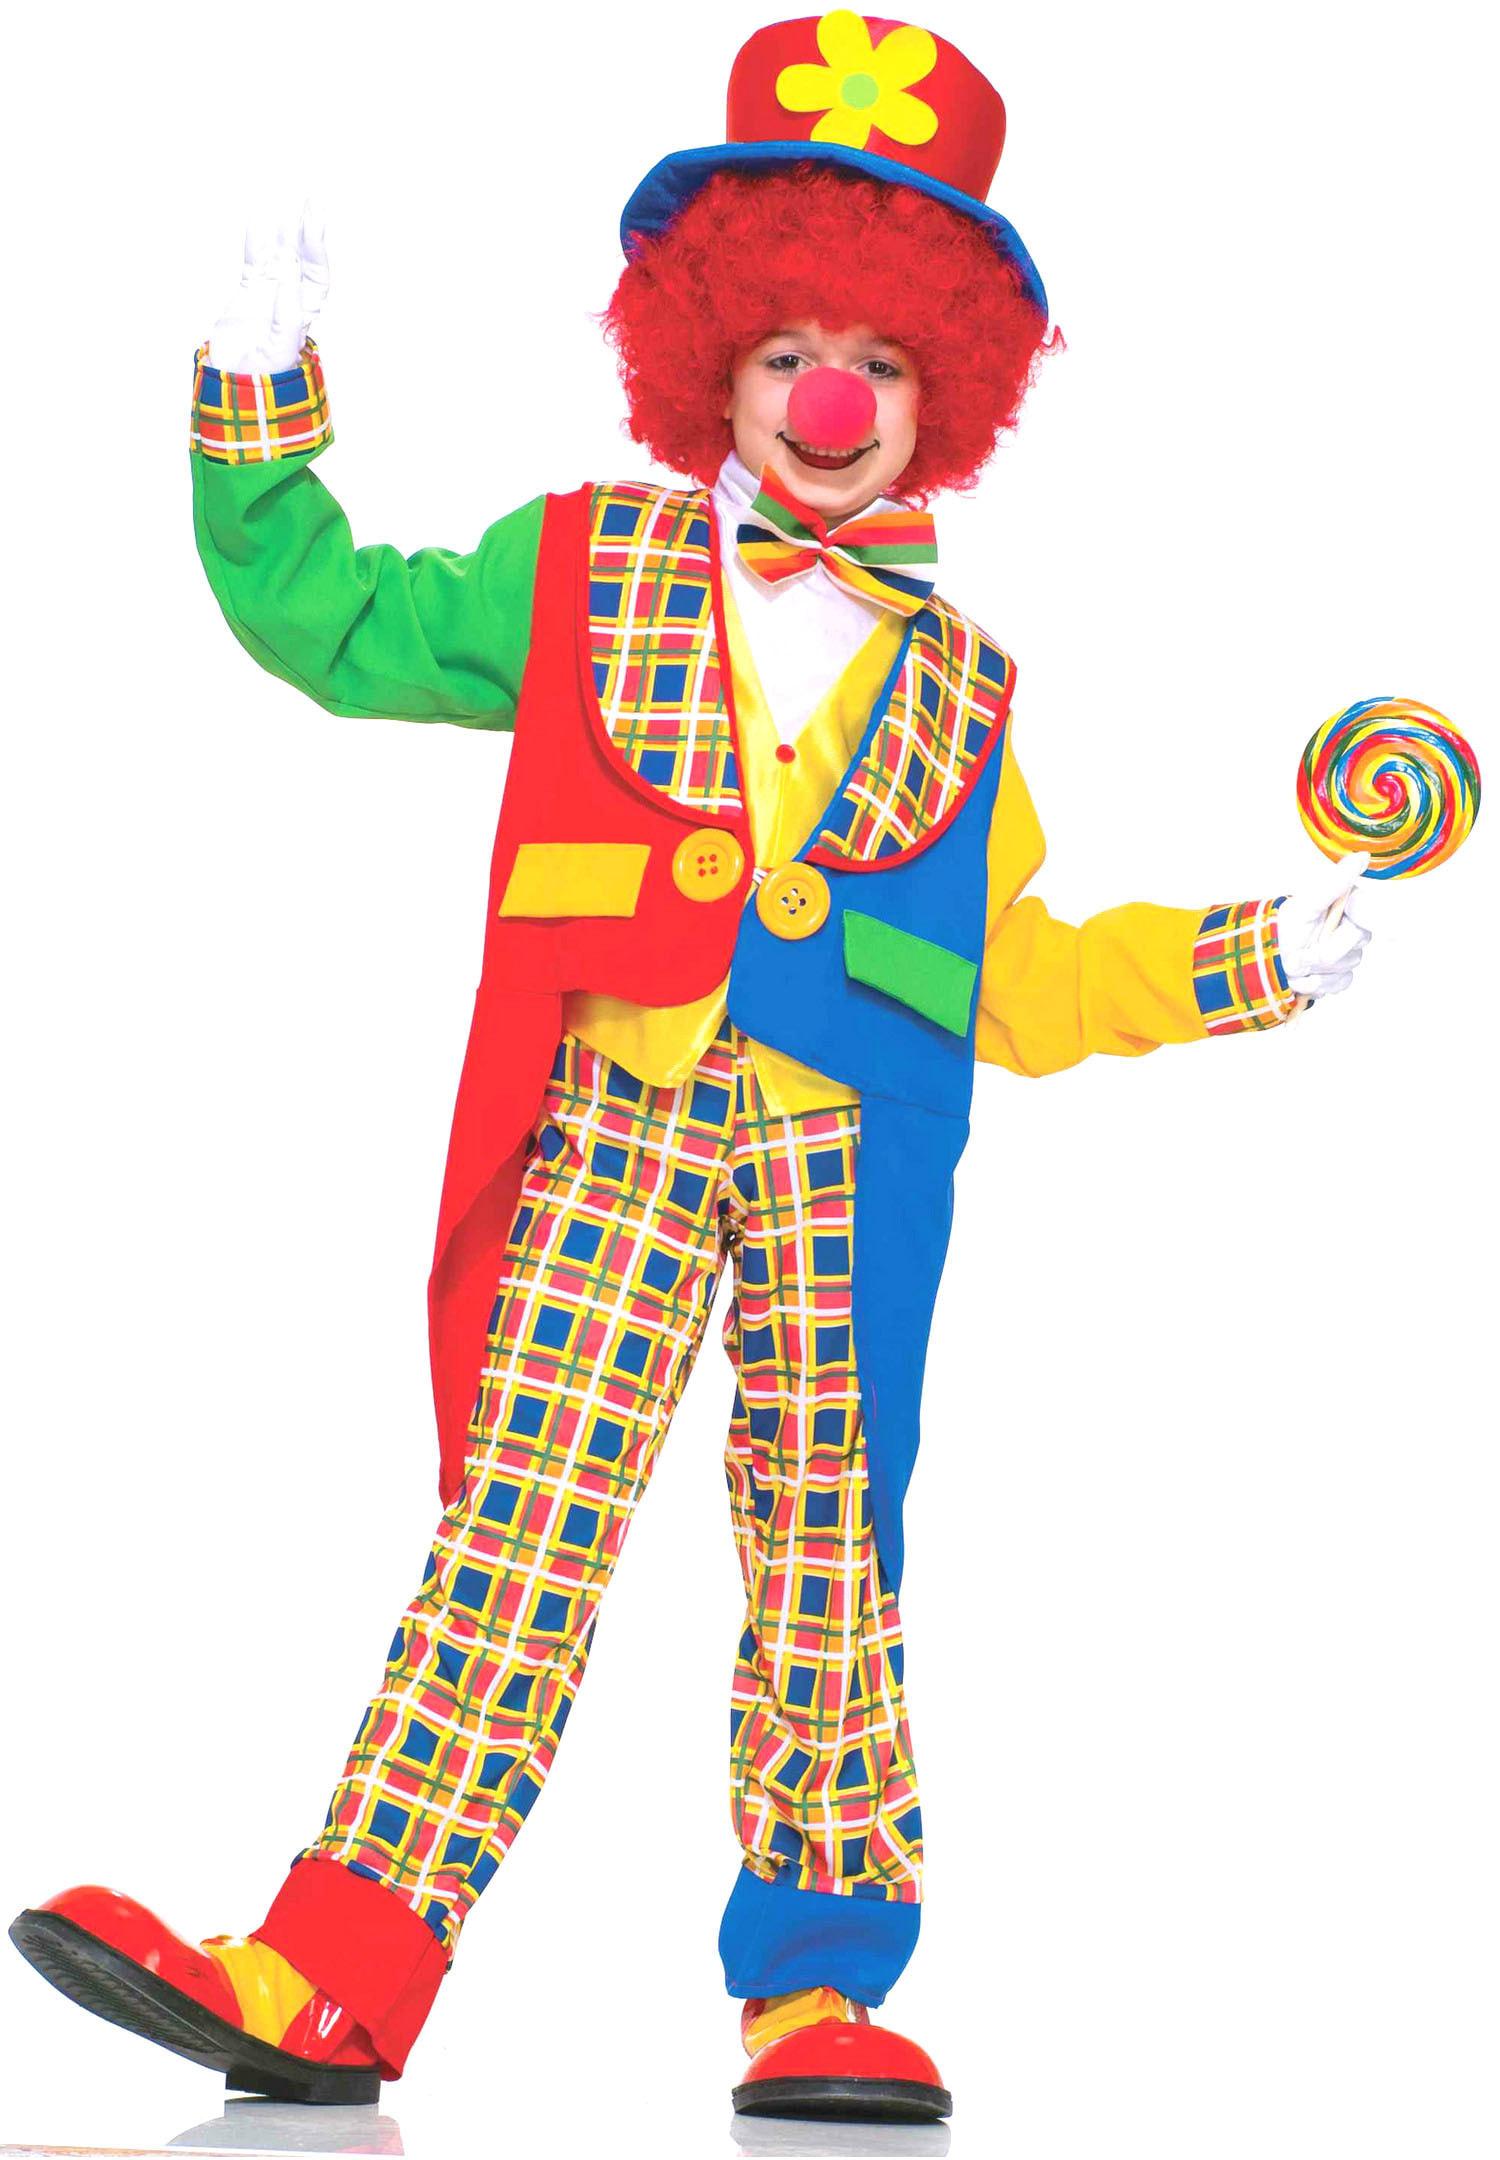 маскарад клоуна фото выбранная вами